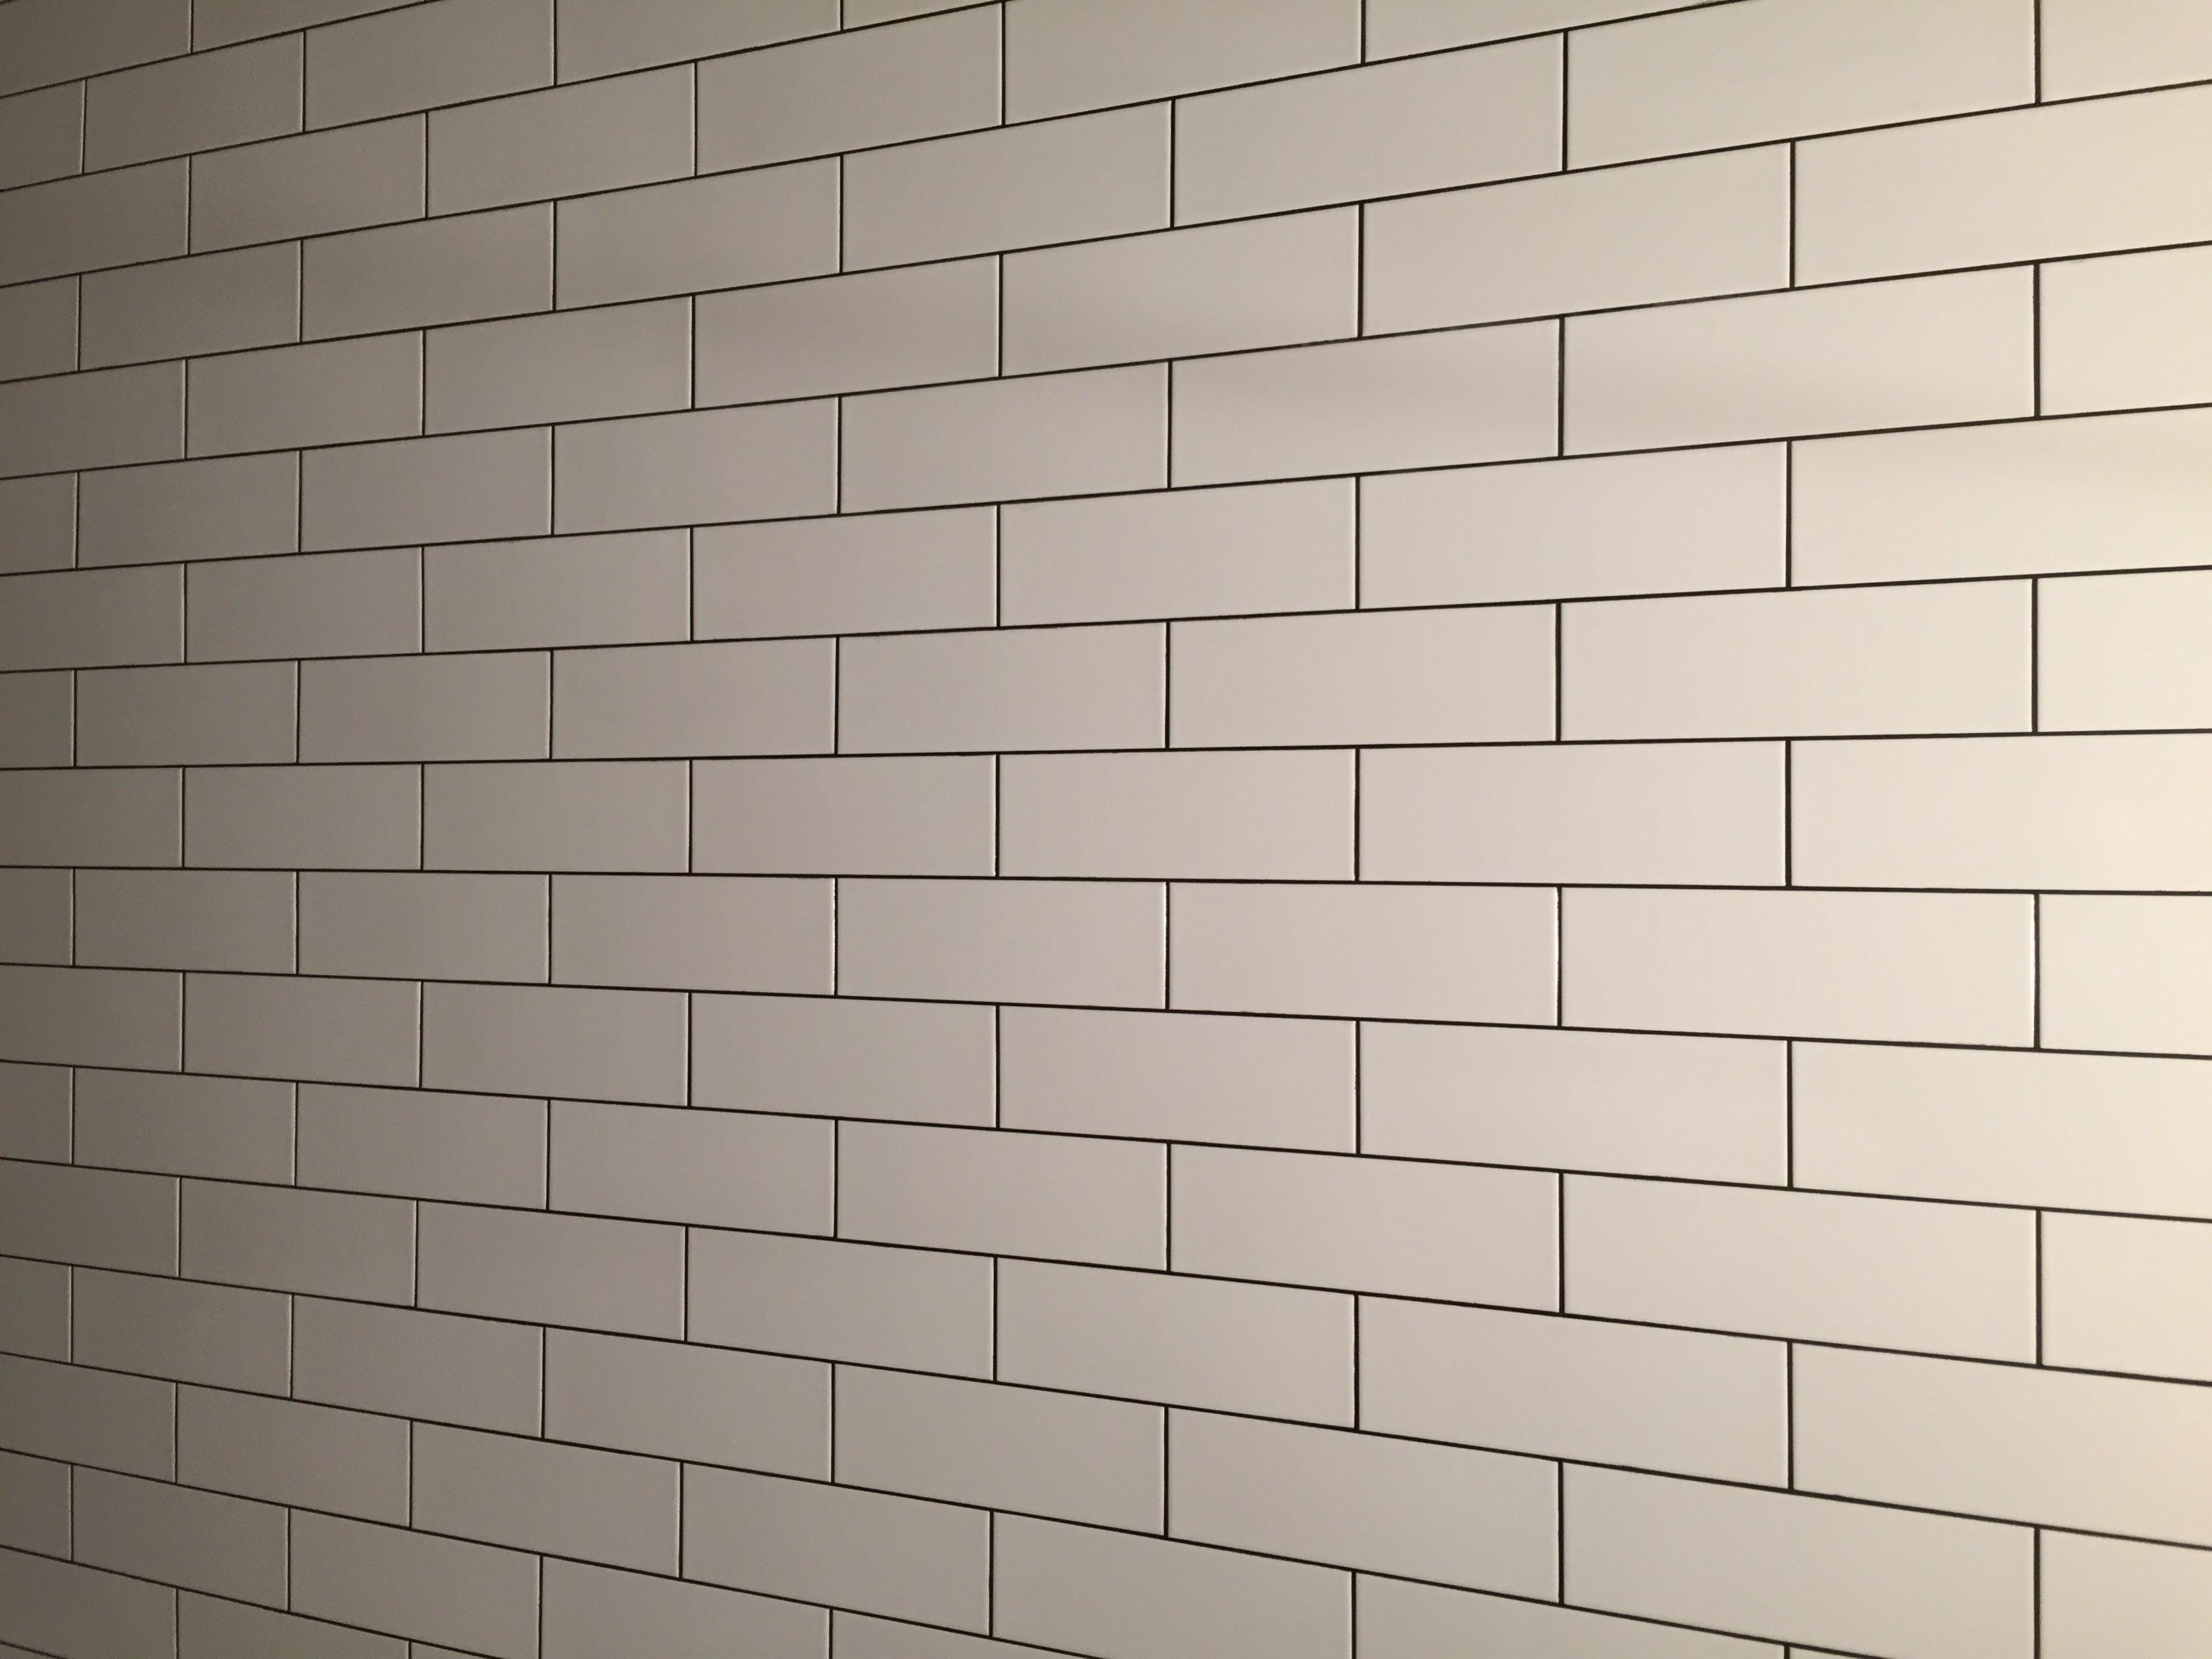 Free stock photo of subway tiles